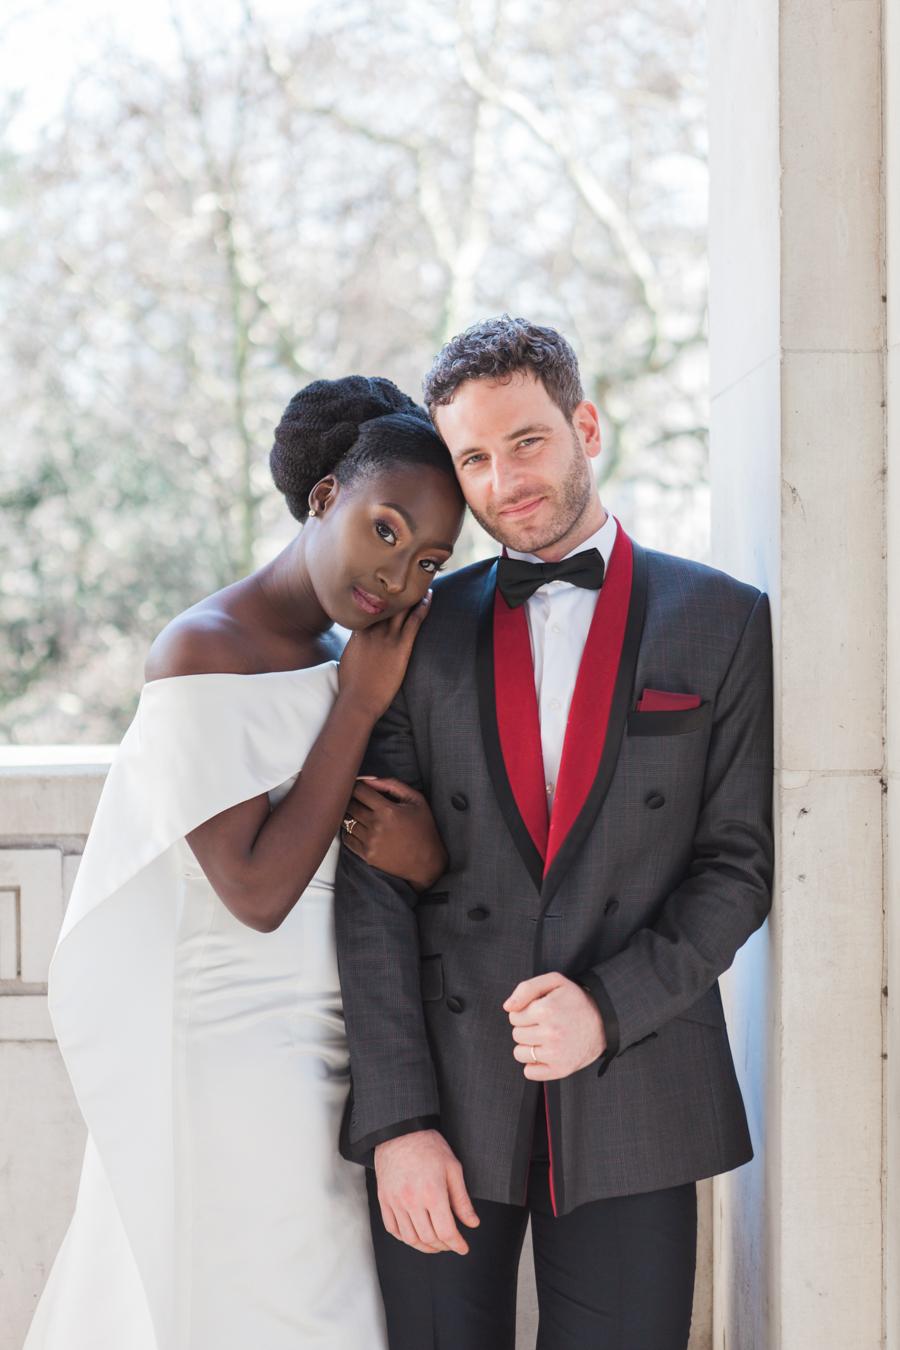 Breathtakingly beautiful - diversity wins in this stunning RSA London wedding editorial! (8)